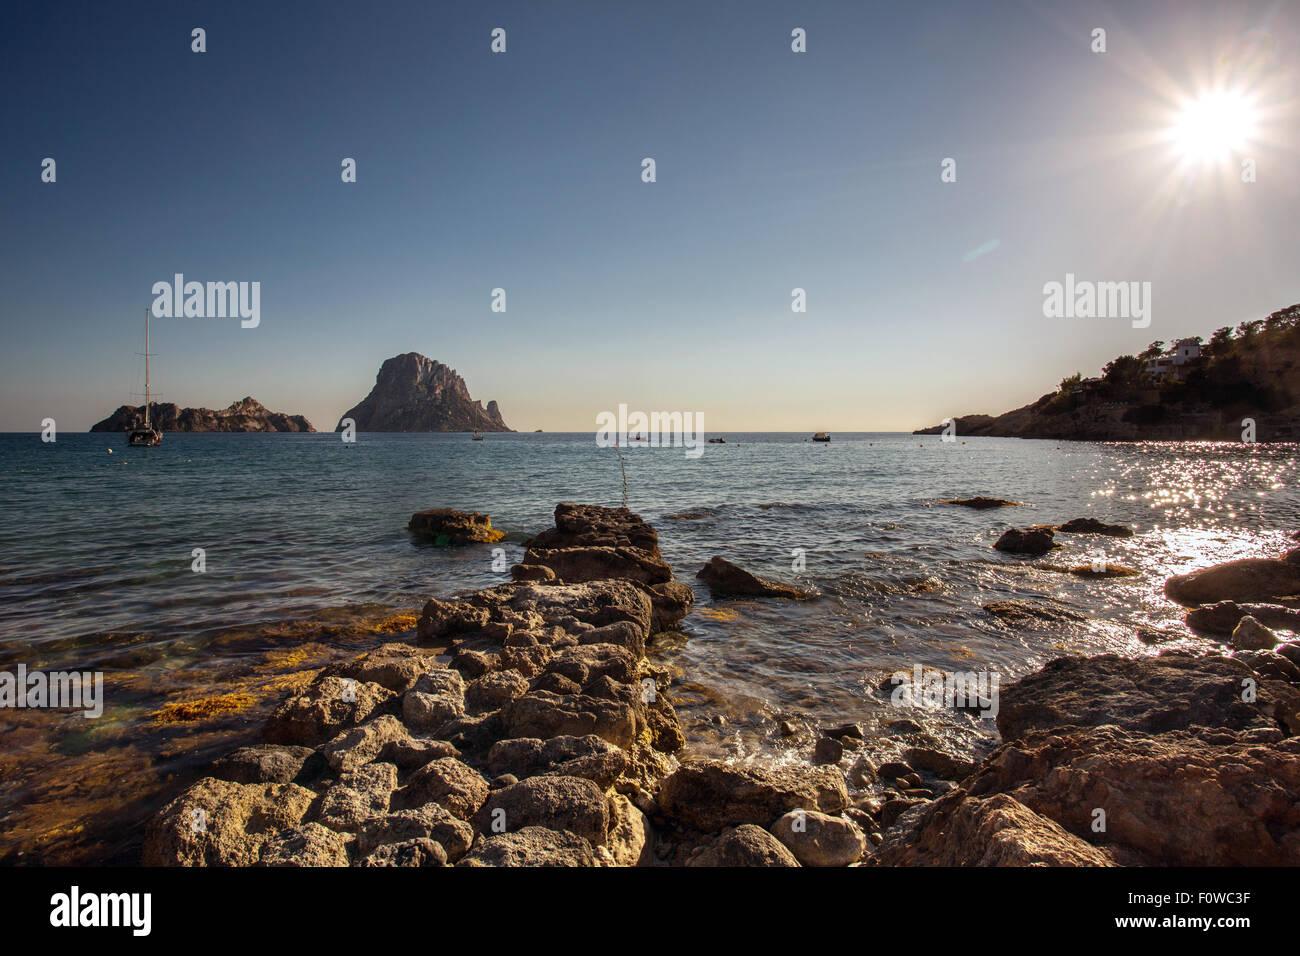 Ibiza (Eivissa), Es Vedra Rock Photo Stock